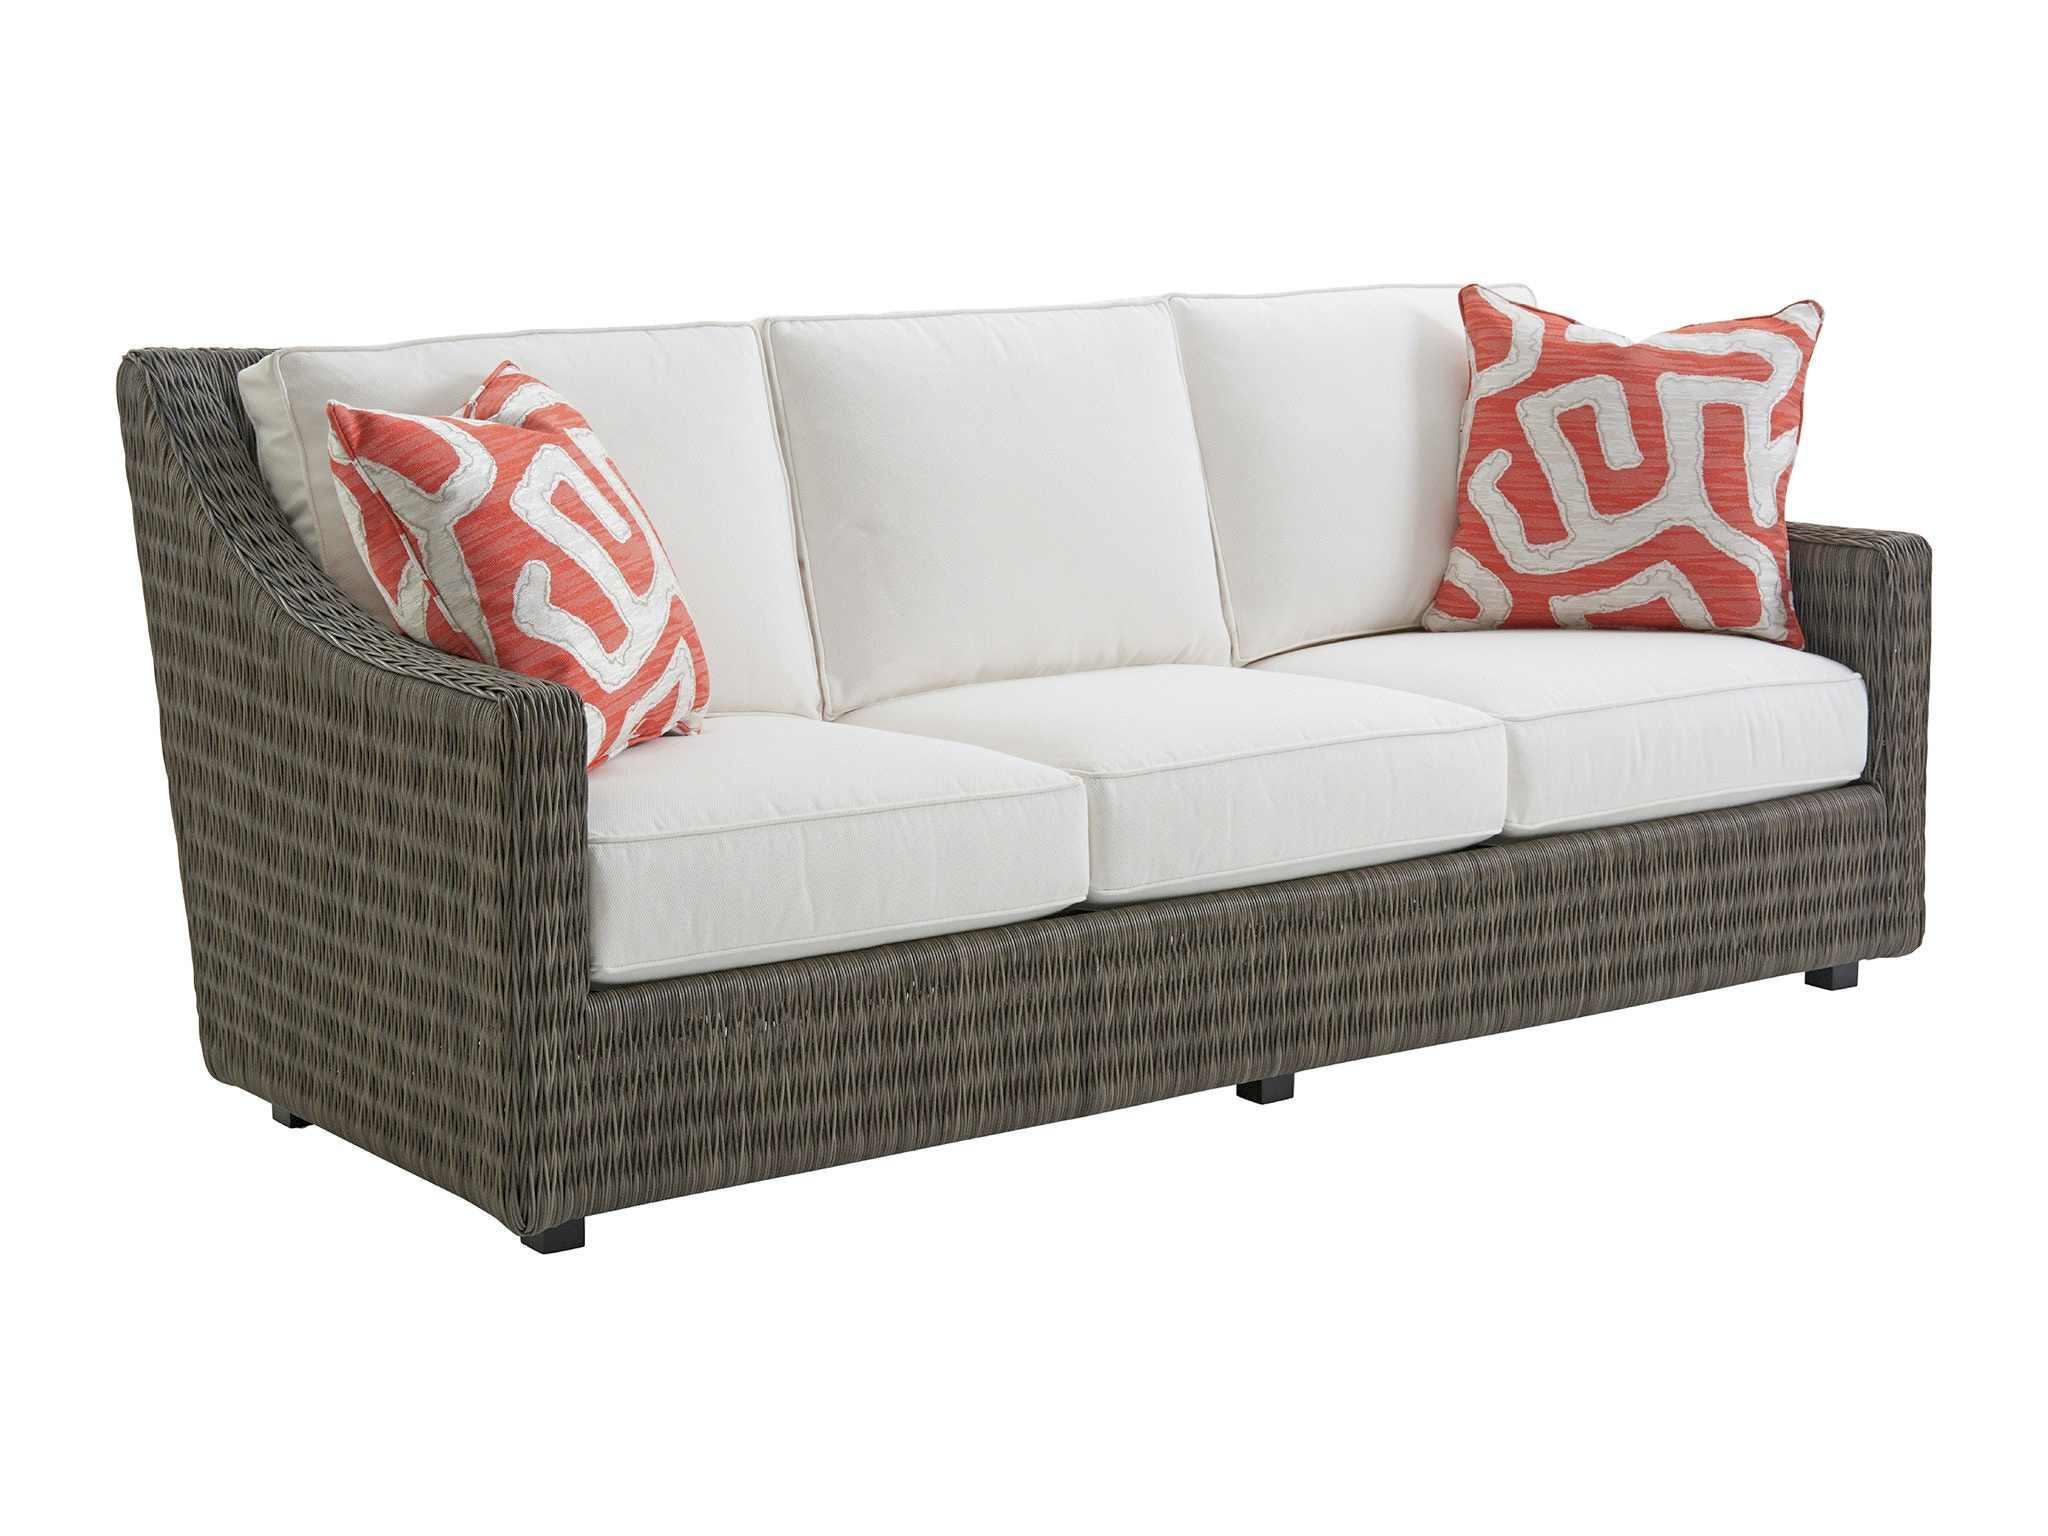 Tommy Bahama Outdoor Living Short Sofa 3900 31